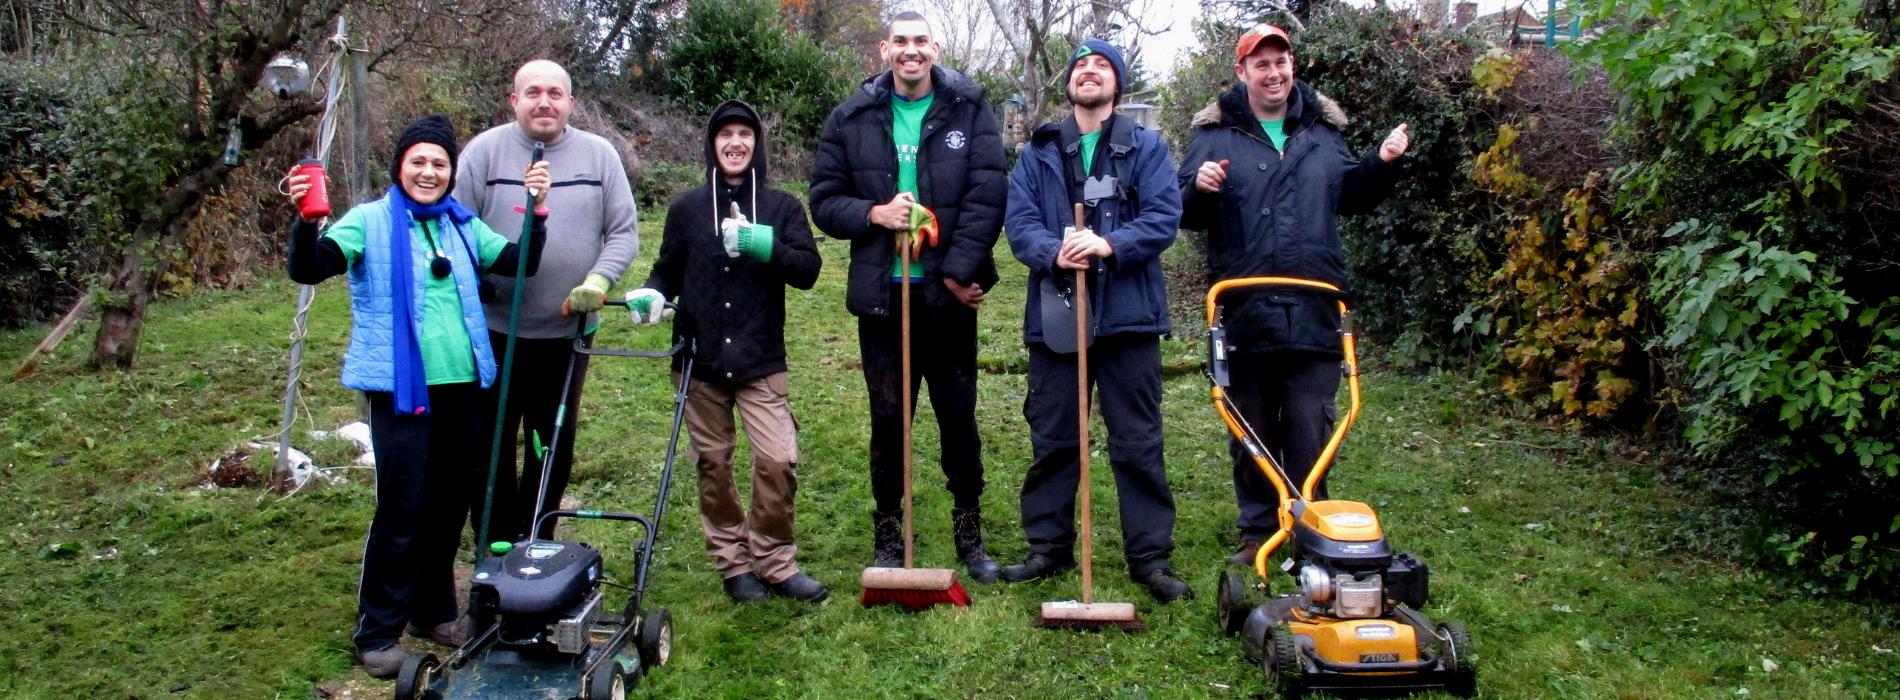 Green Aiders: free garden rescue